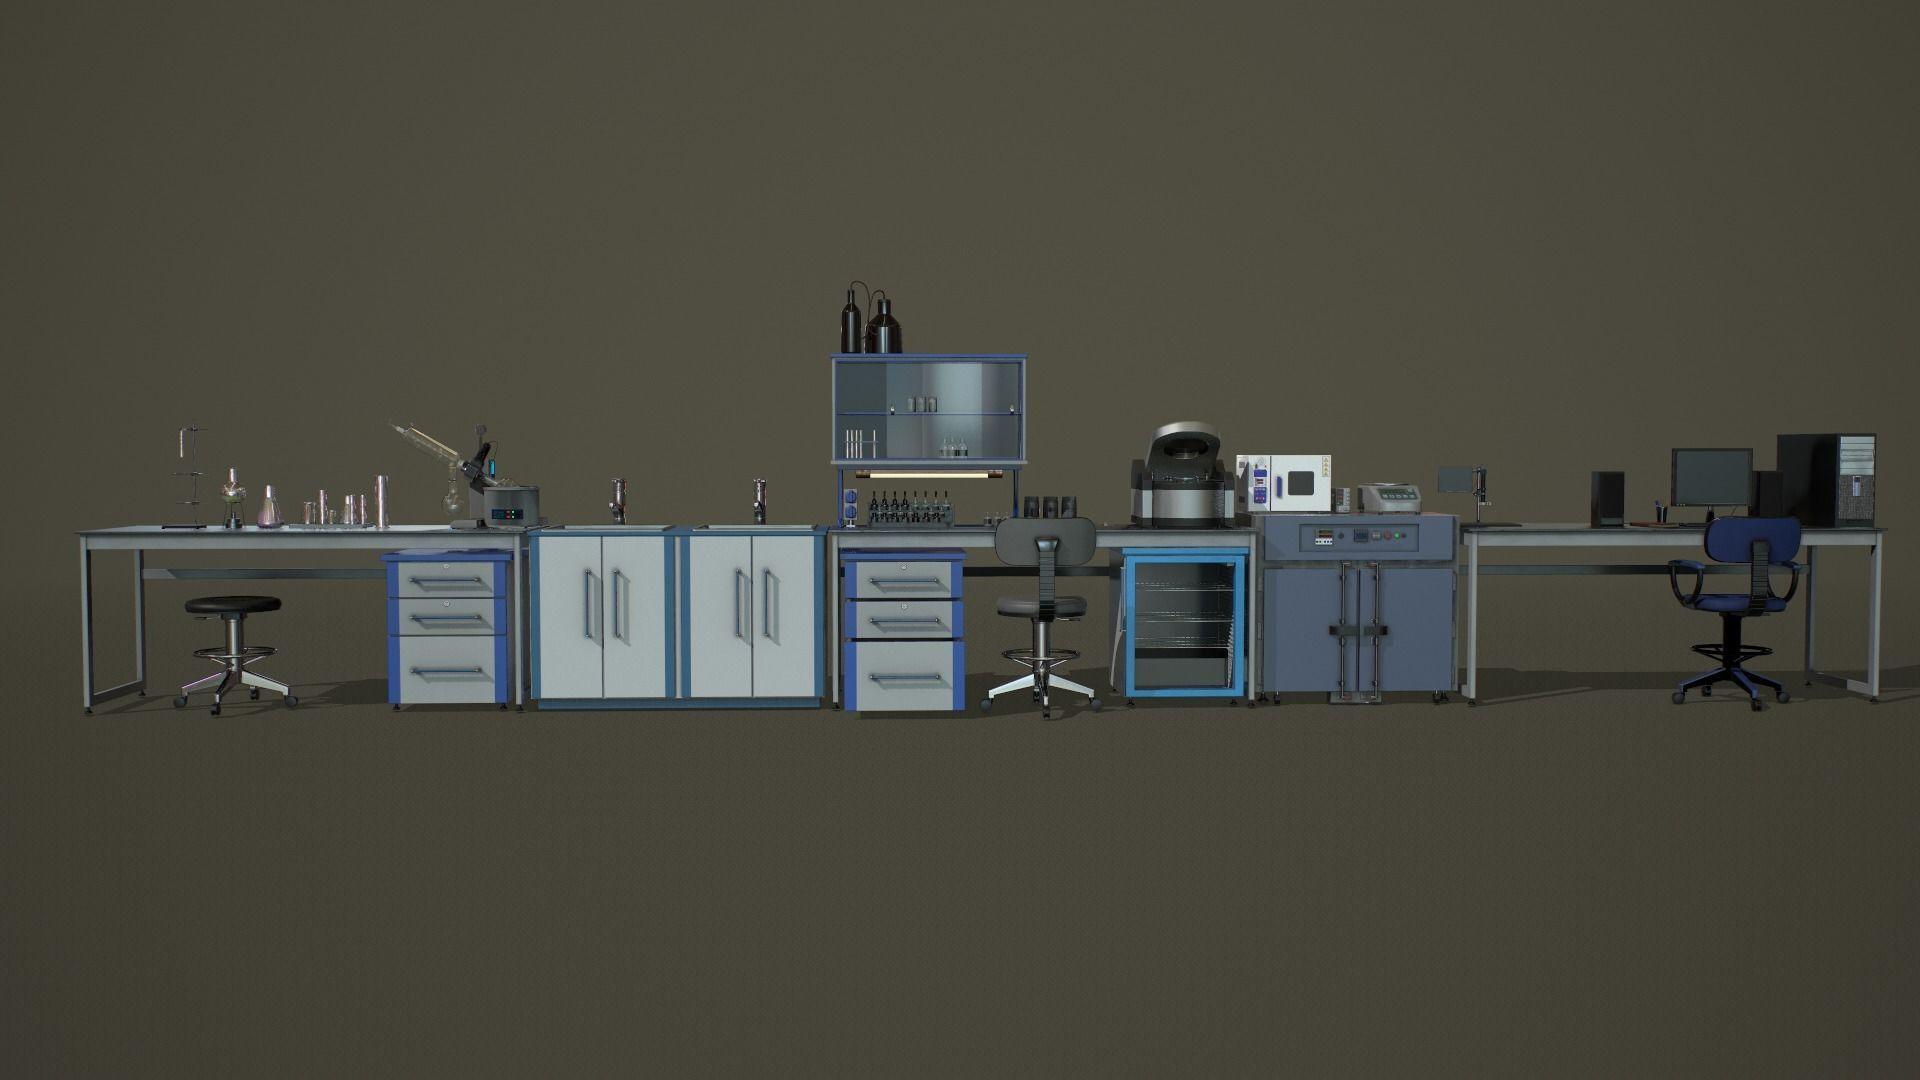 LaboratorPACK PBR